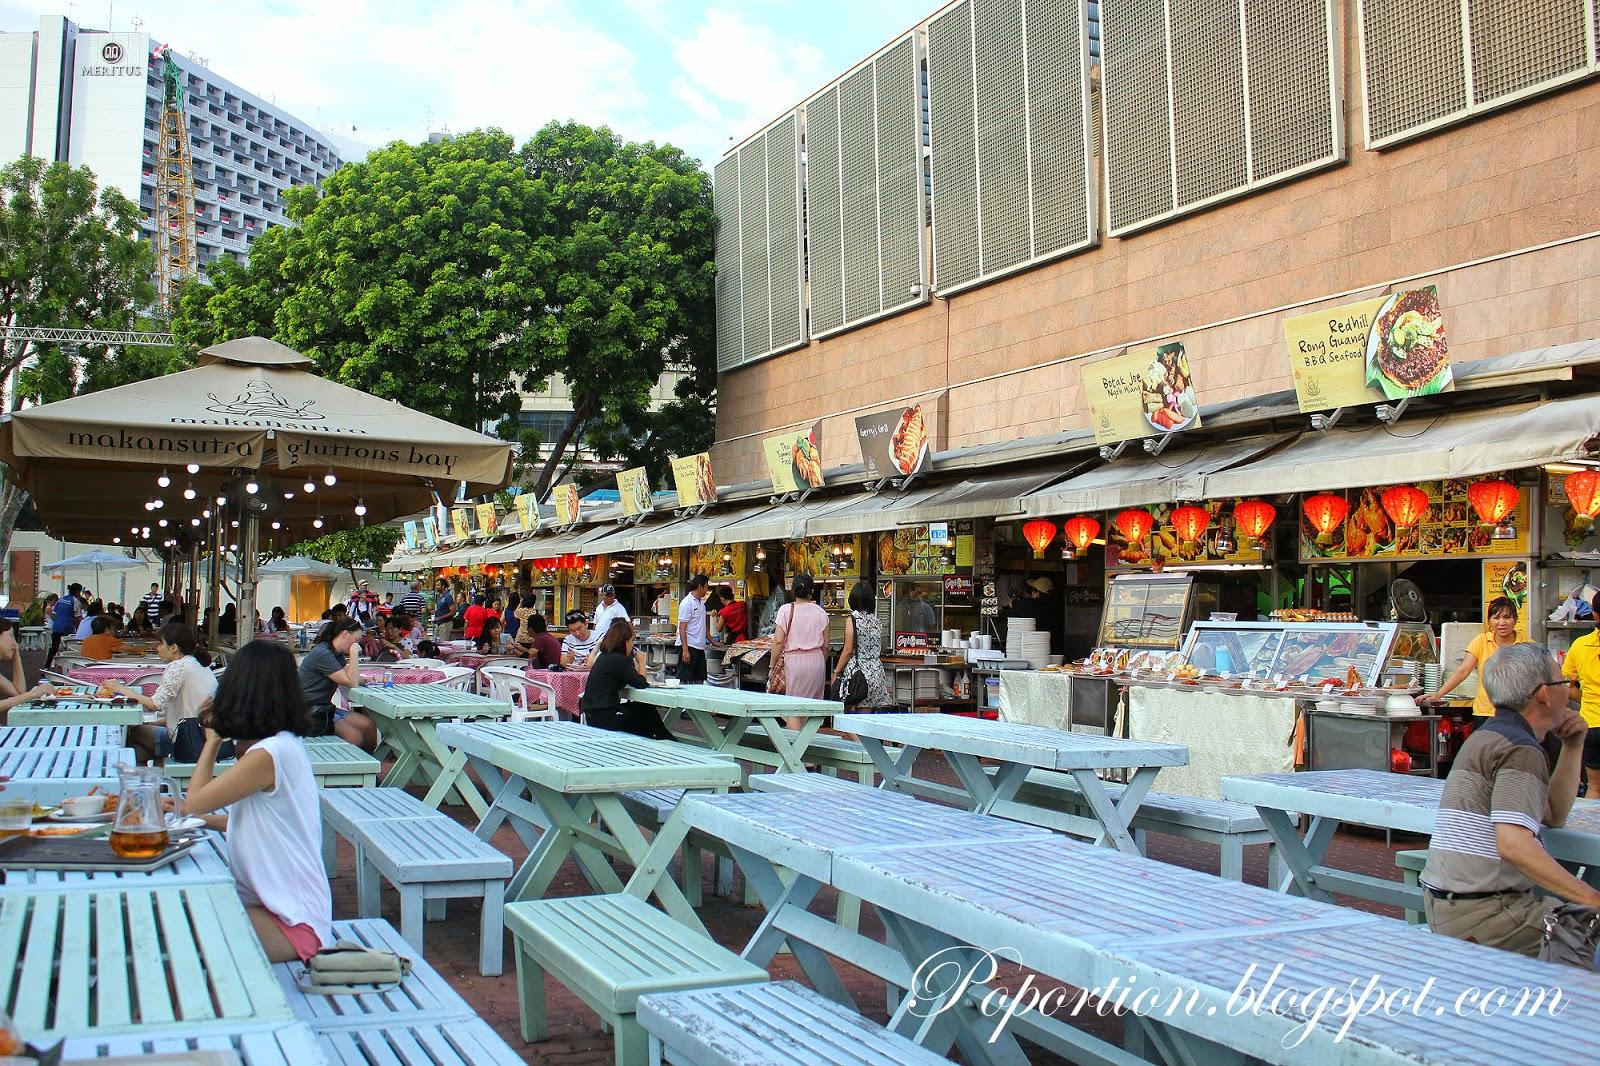 singapore hawker fare makansutra glutton bay